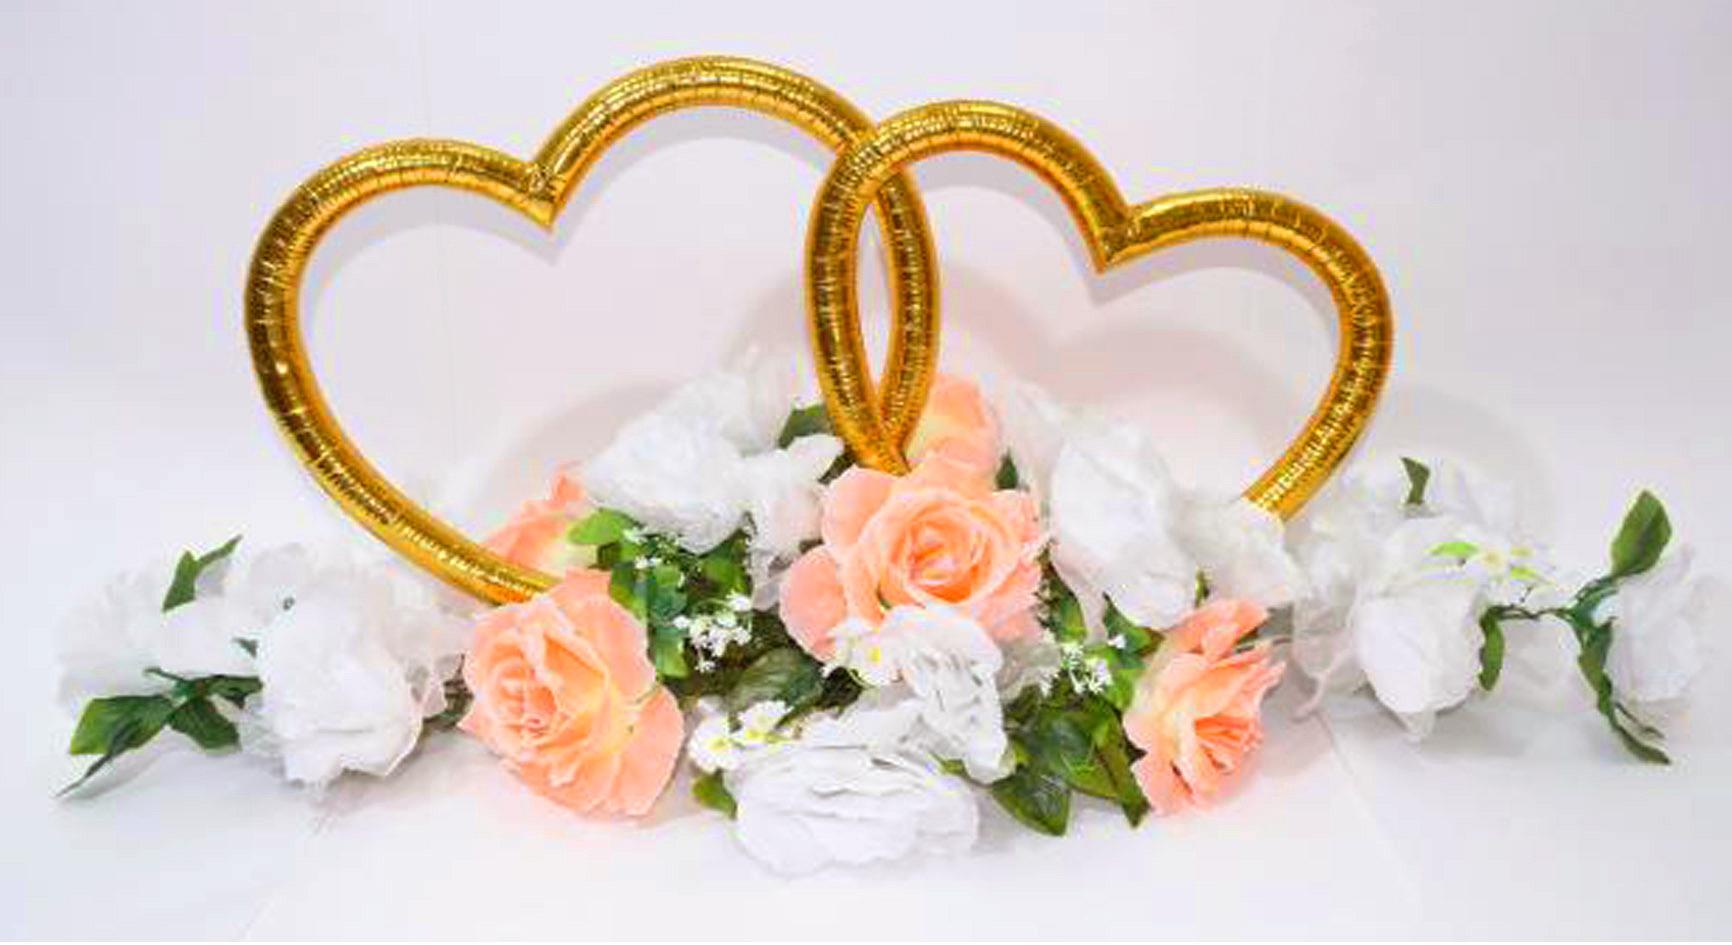 Фото презентация годовщина свадьбы